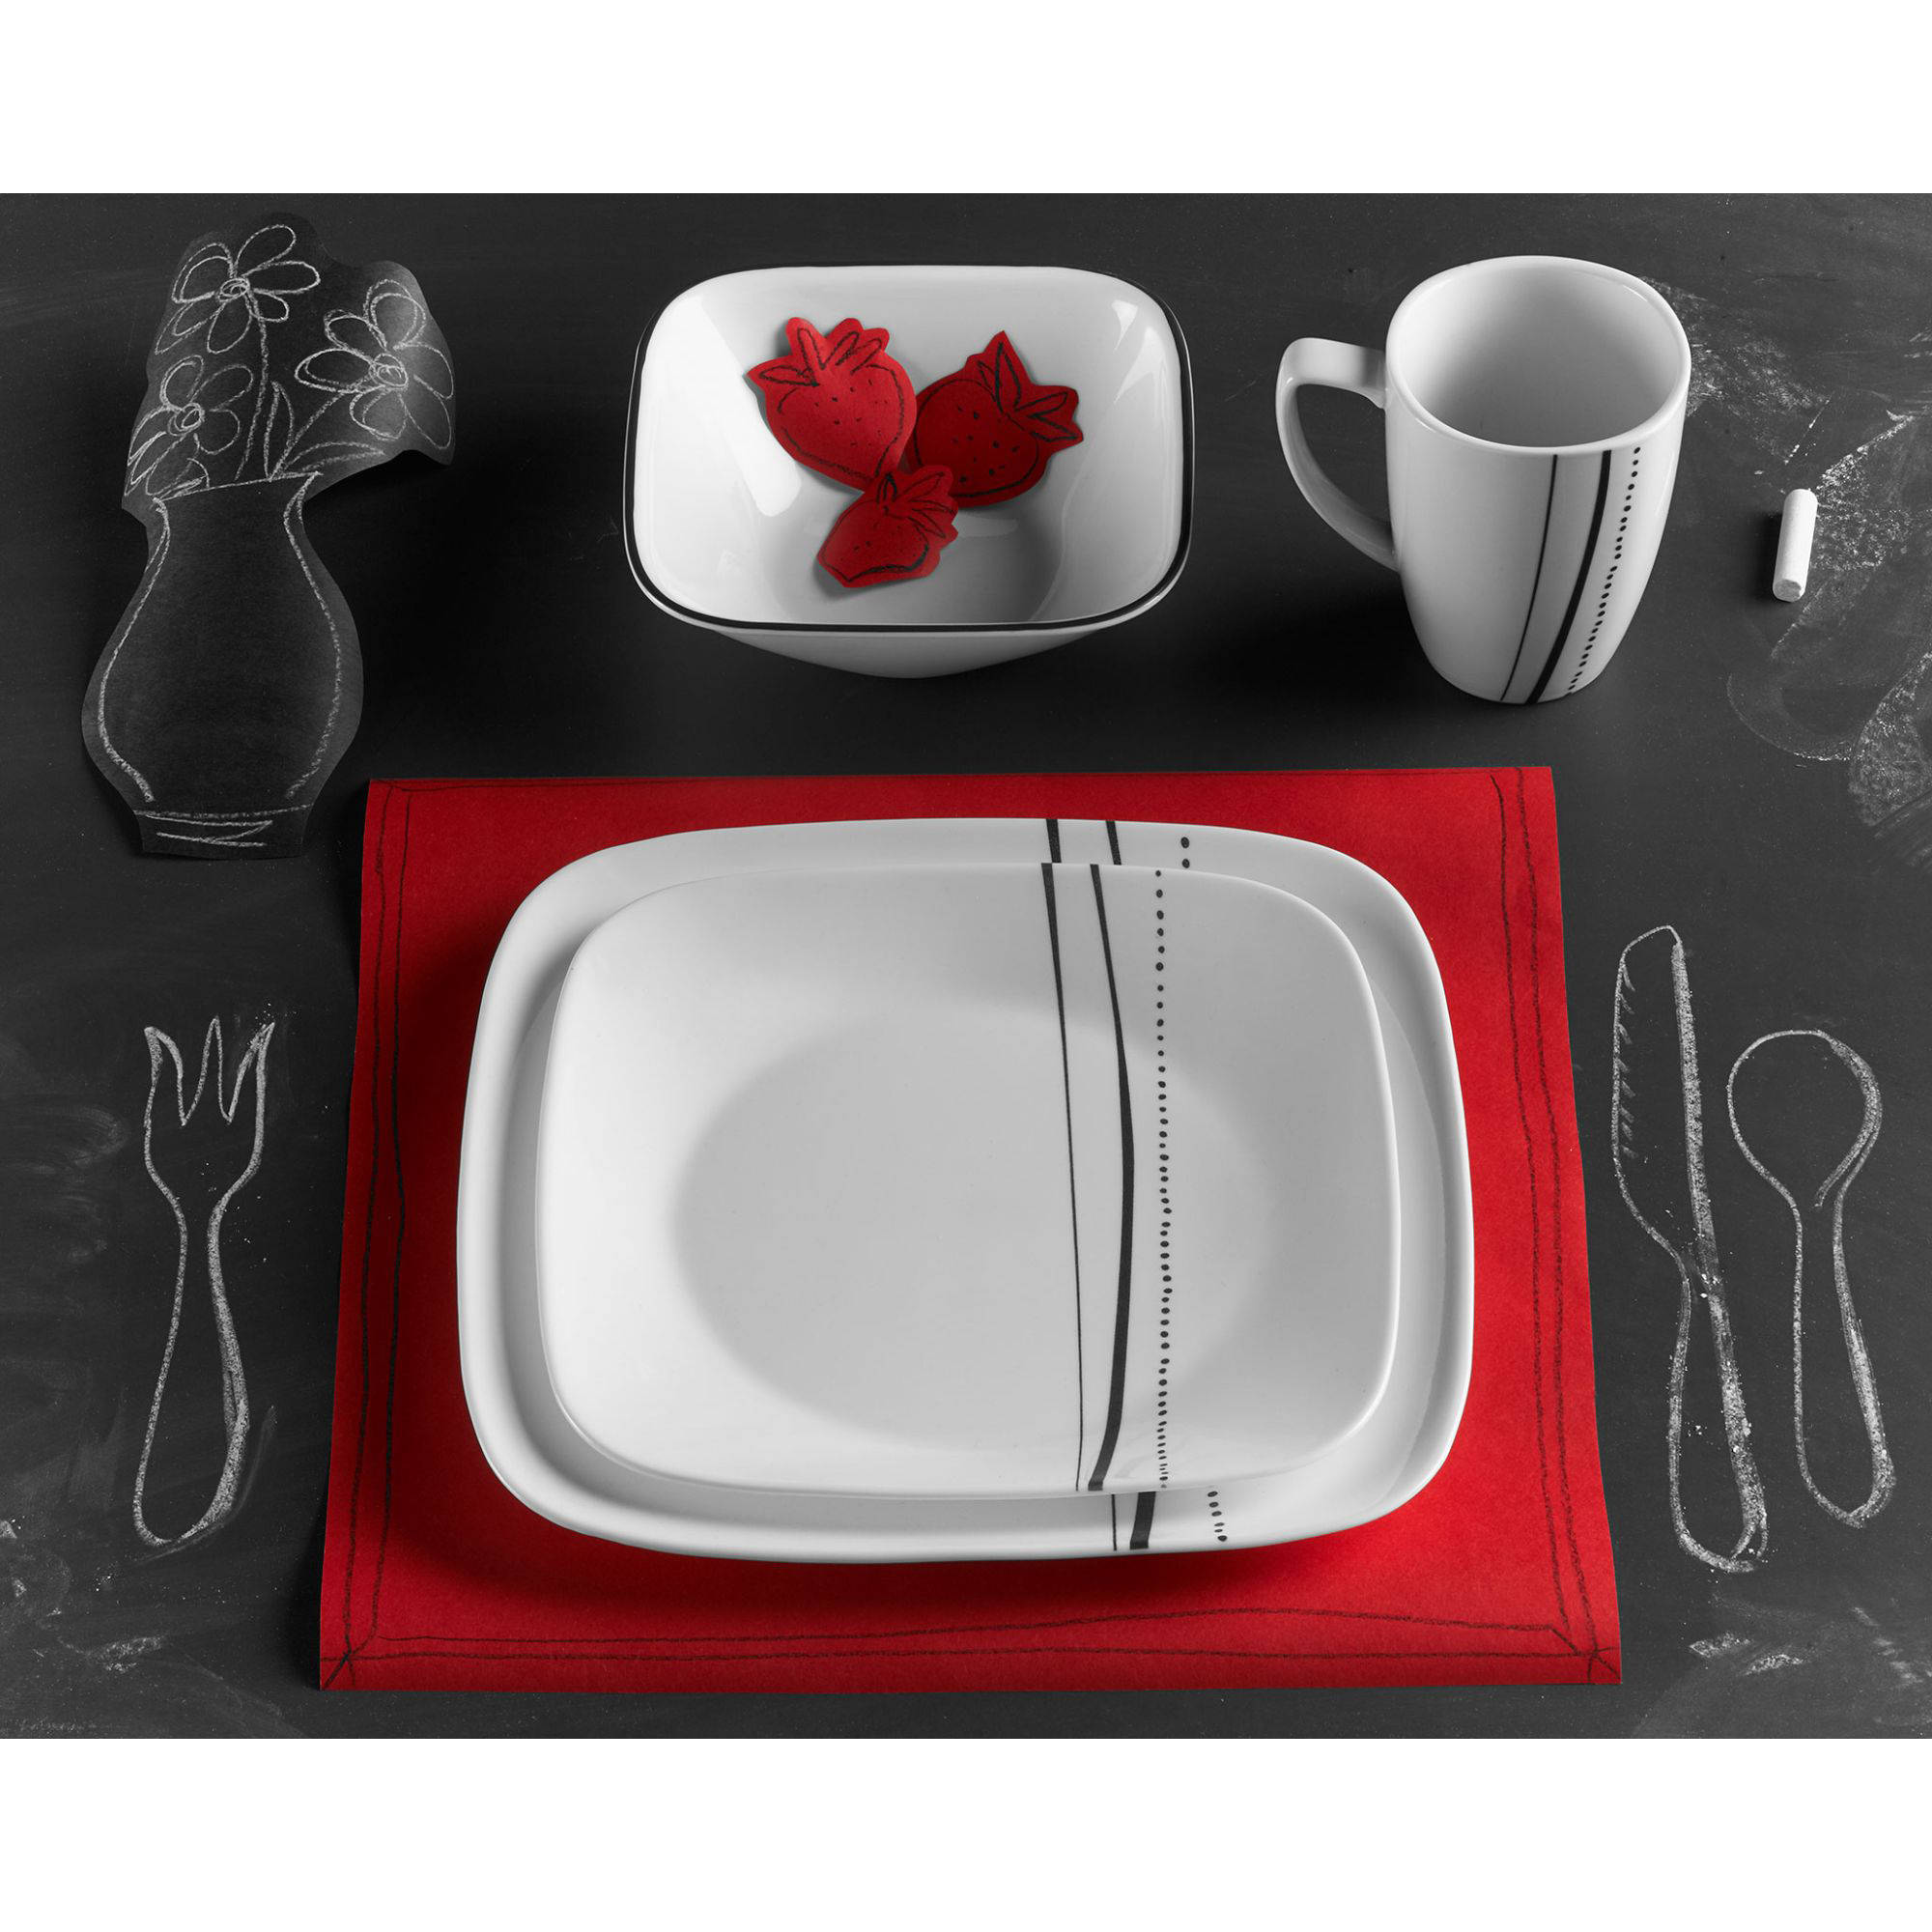 sc 1 st  Walmart & Corelle Square 16-Piece Cascading Lines Dinnerware Set - Walmart.com